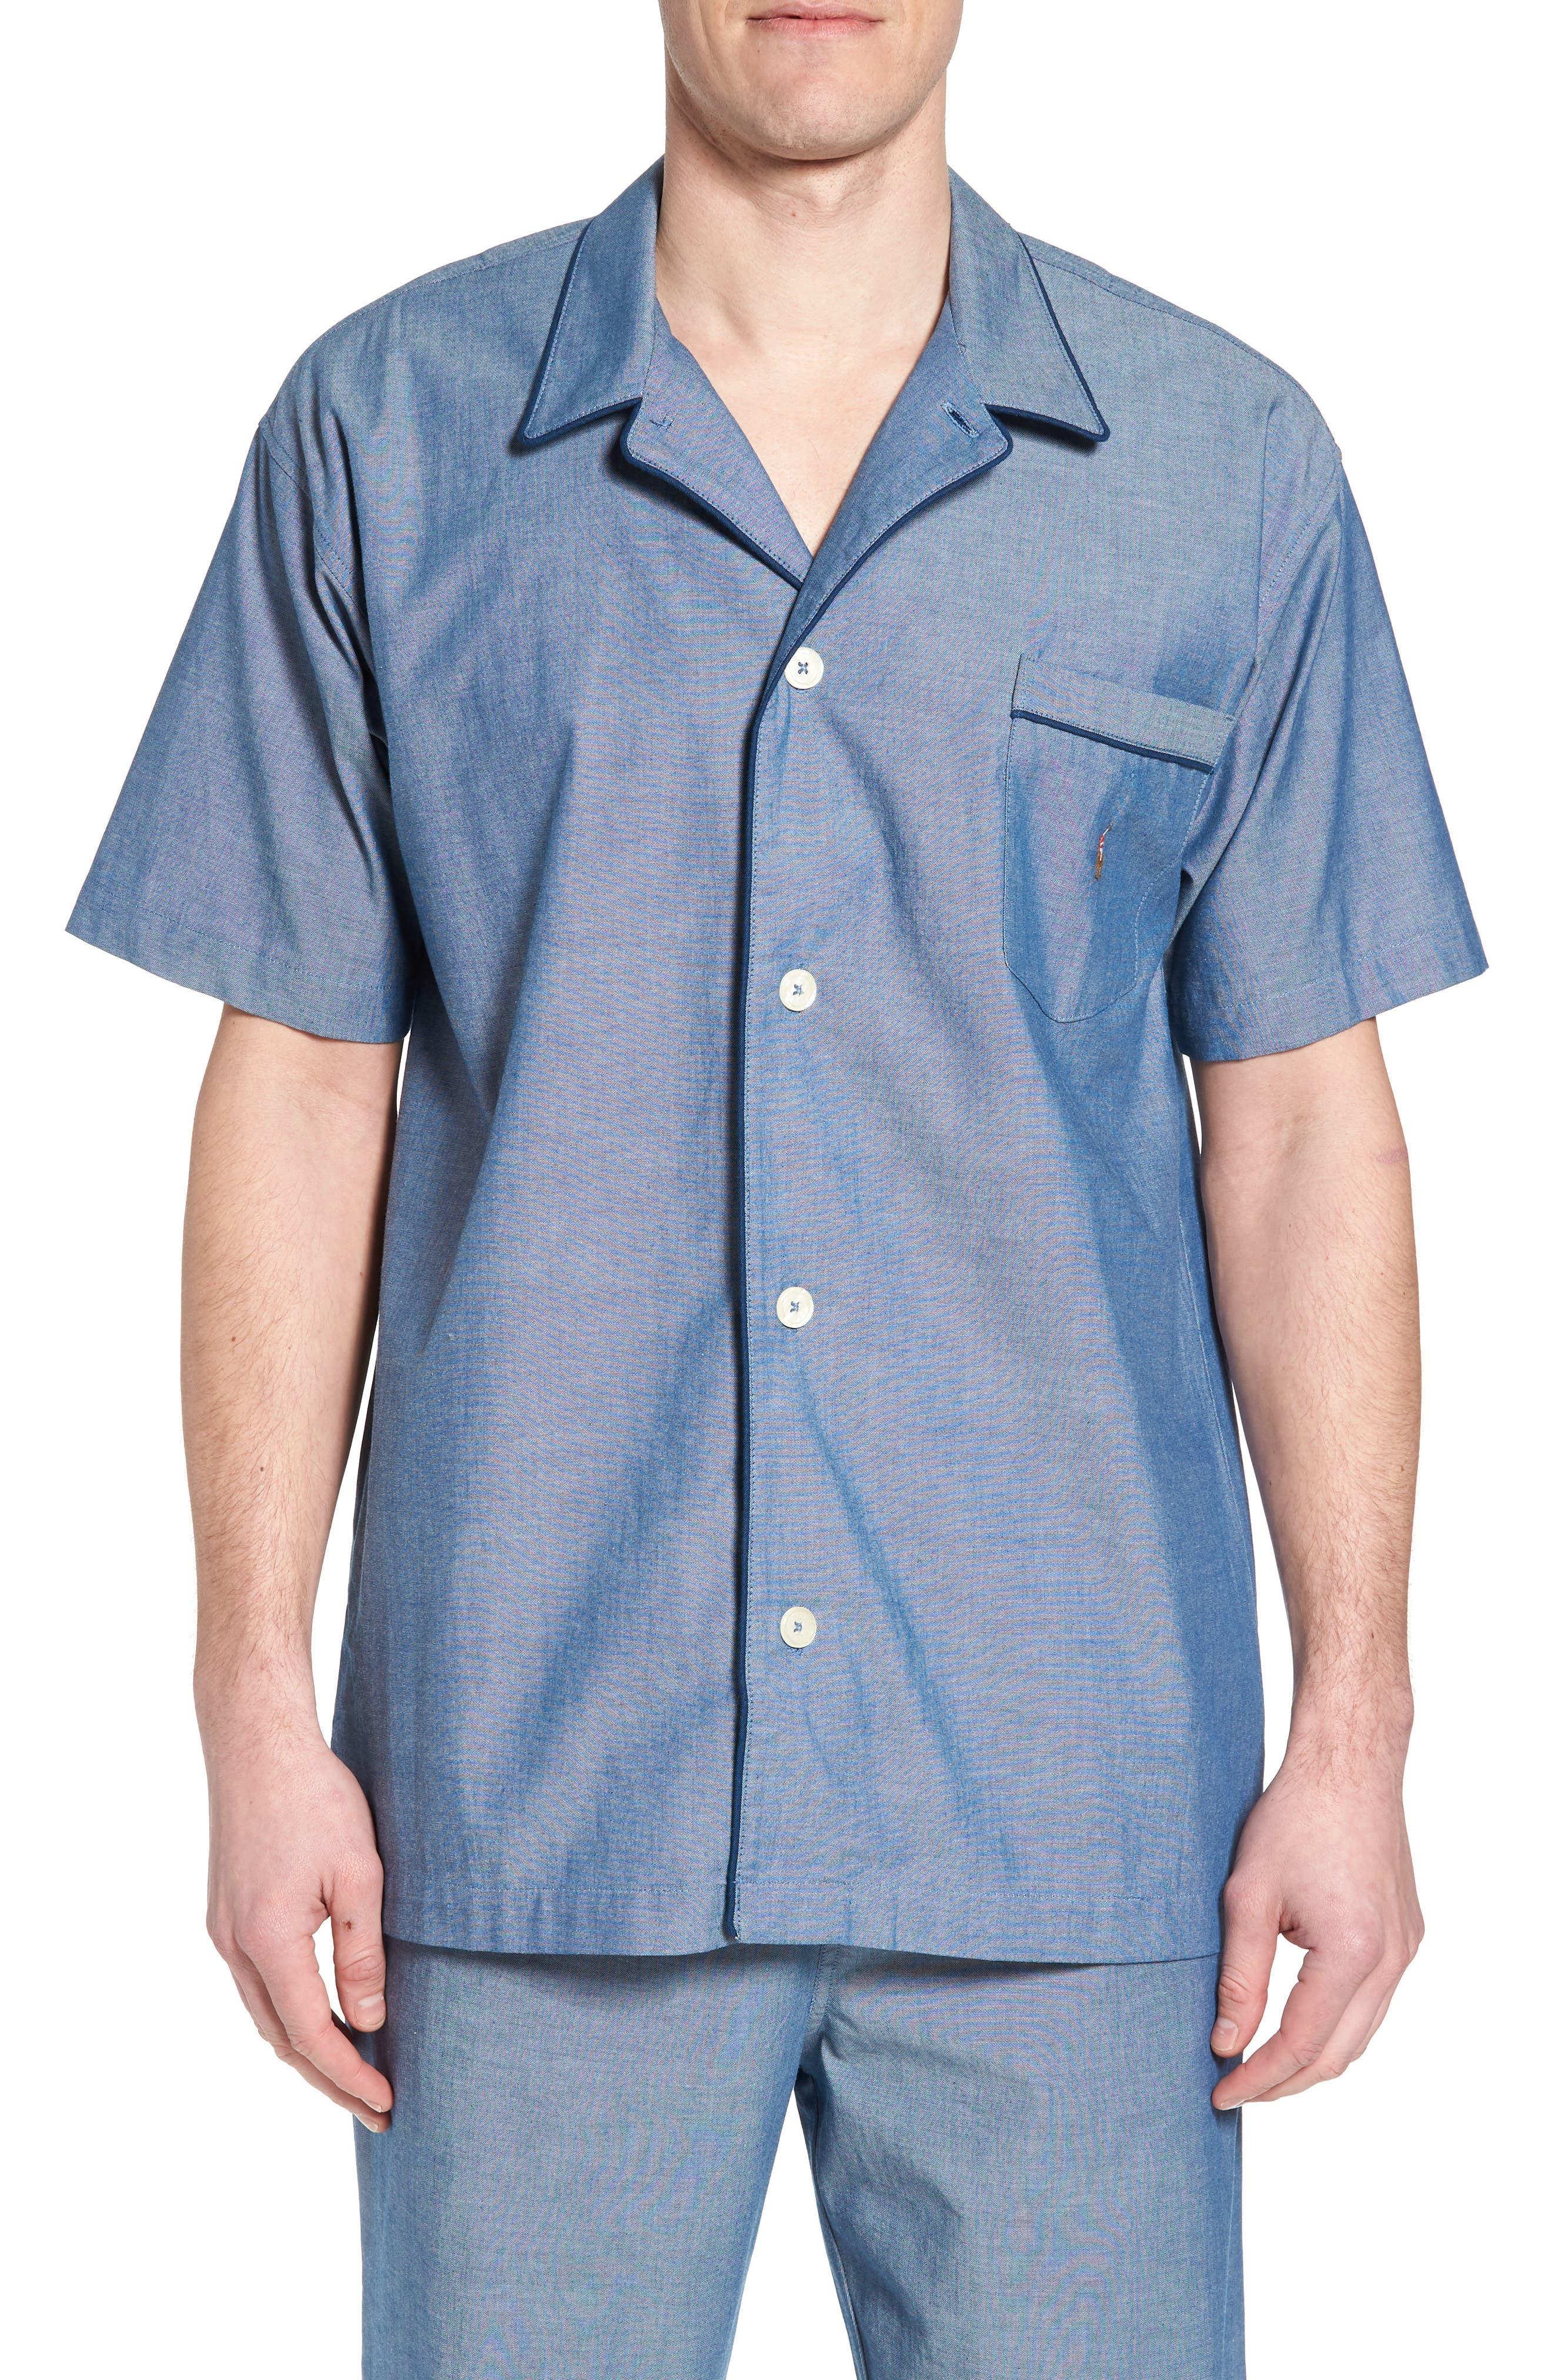 Cotton Pajama Shirt,                             Main thumbnail 1, color,                             Medium Indigo/ Dark Indigo